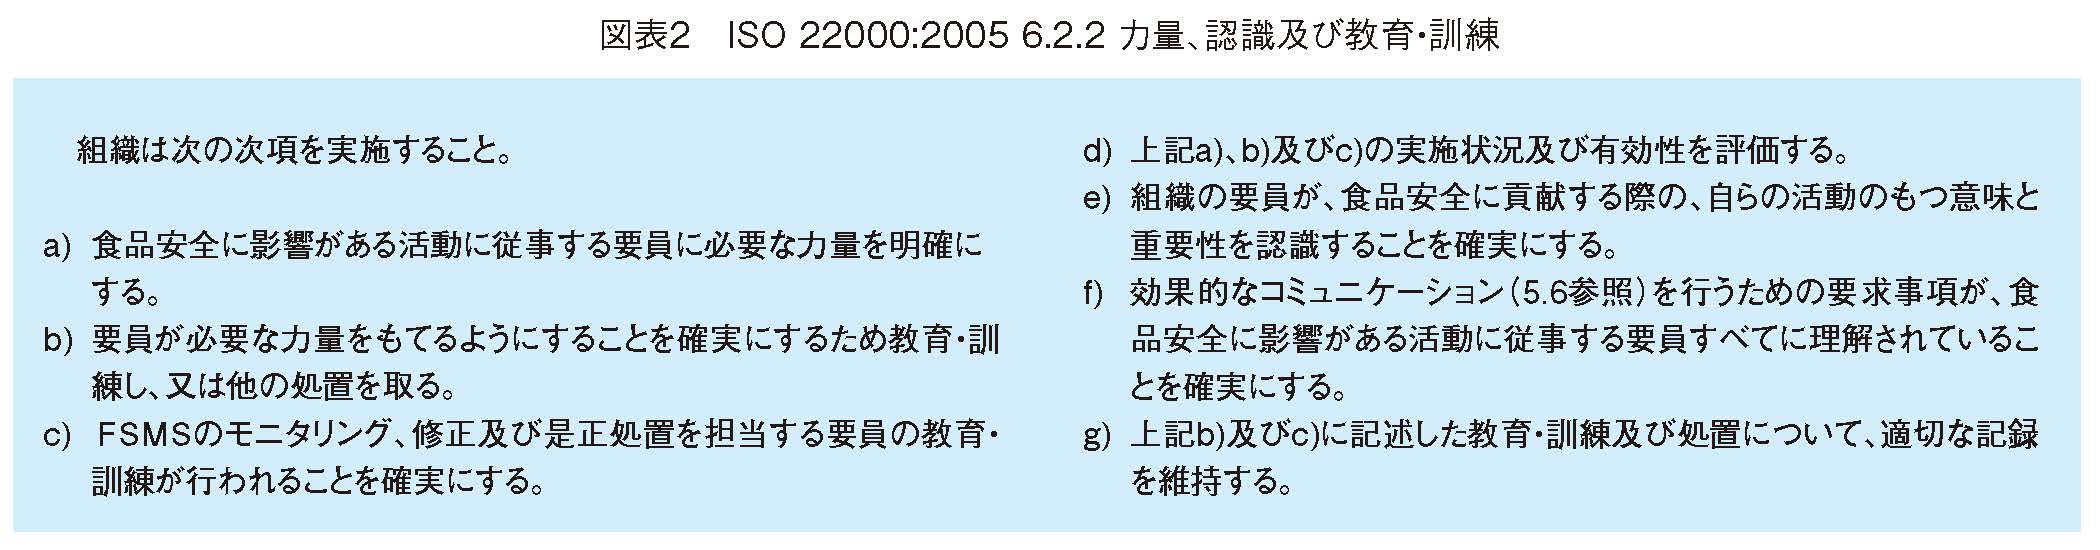 ISO 22000:2005 6.2.2 力量、認識及び教育・訓練